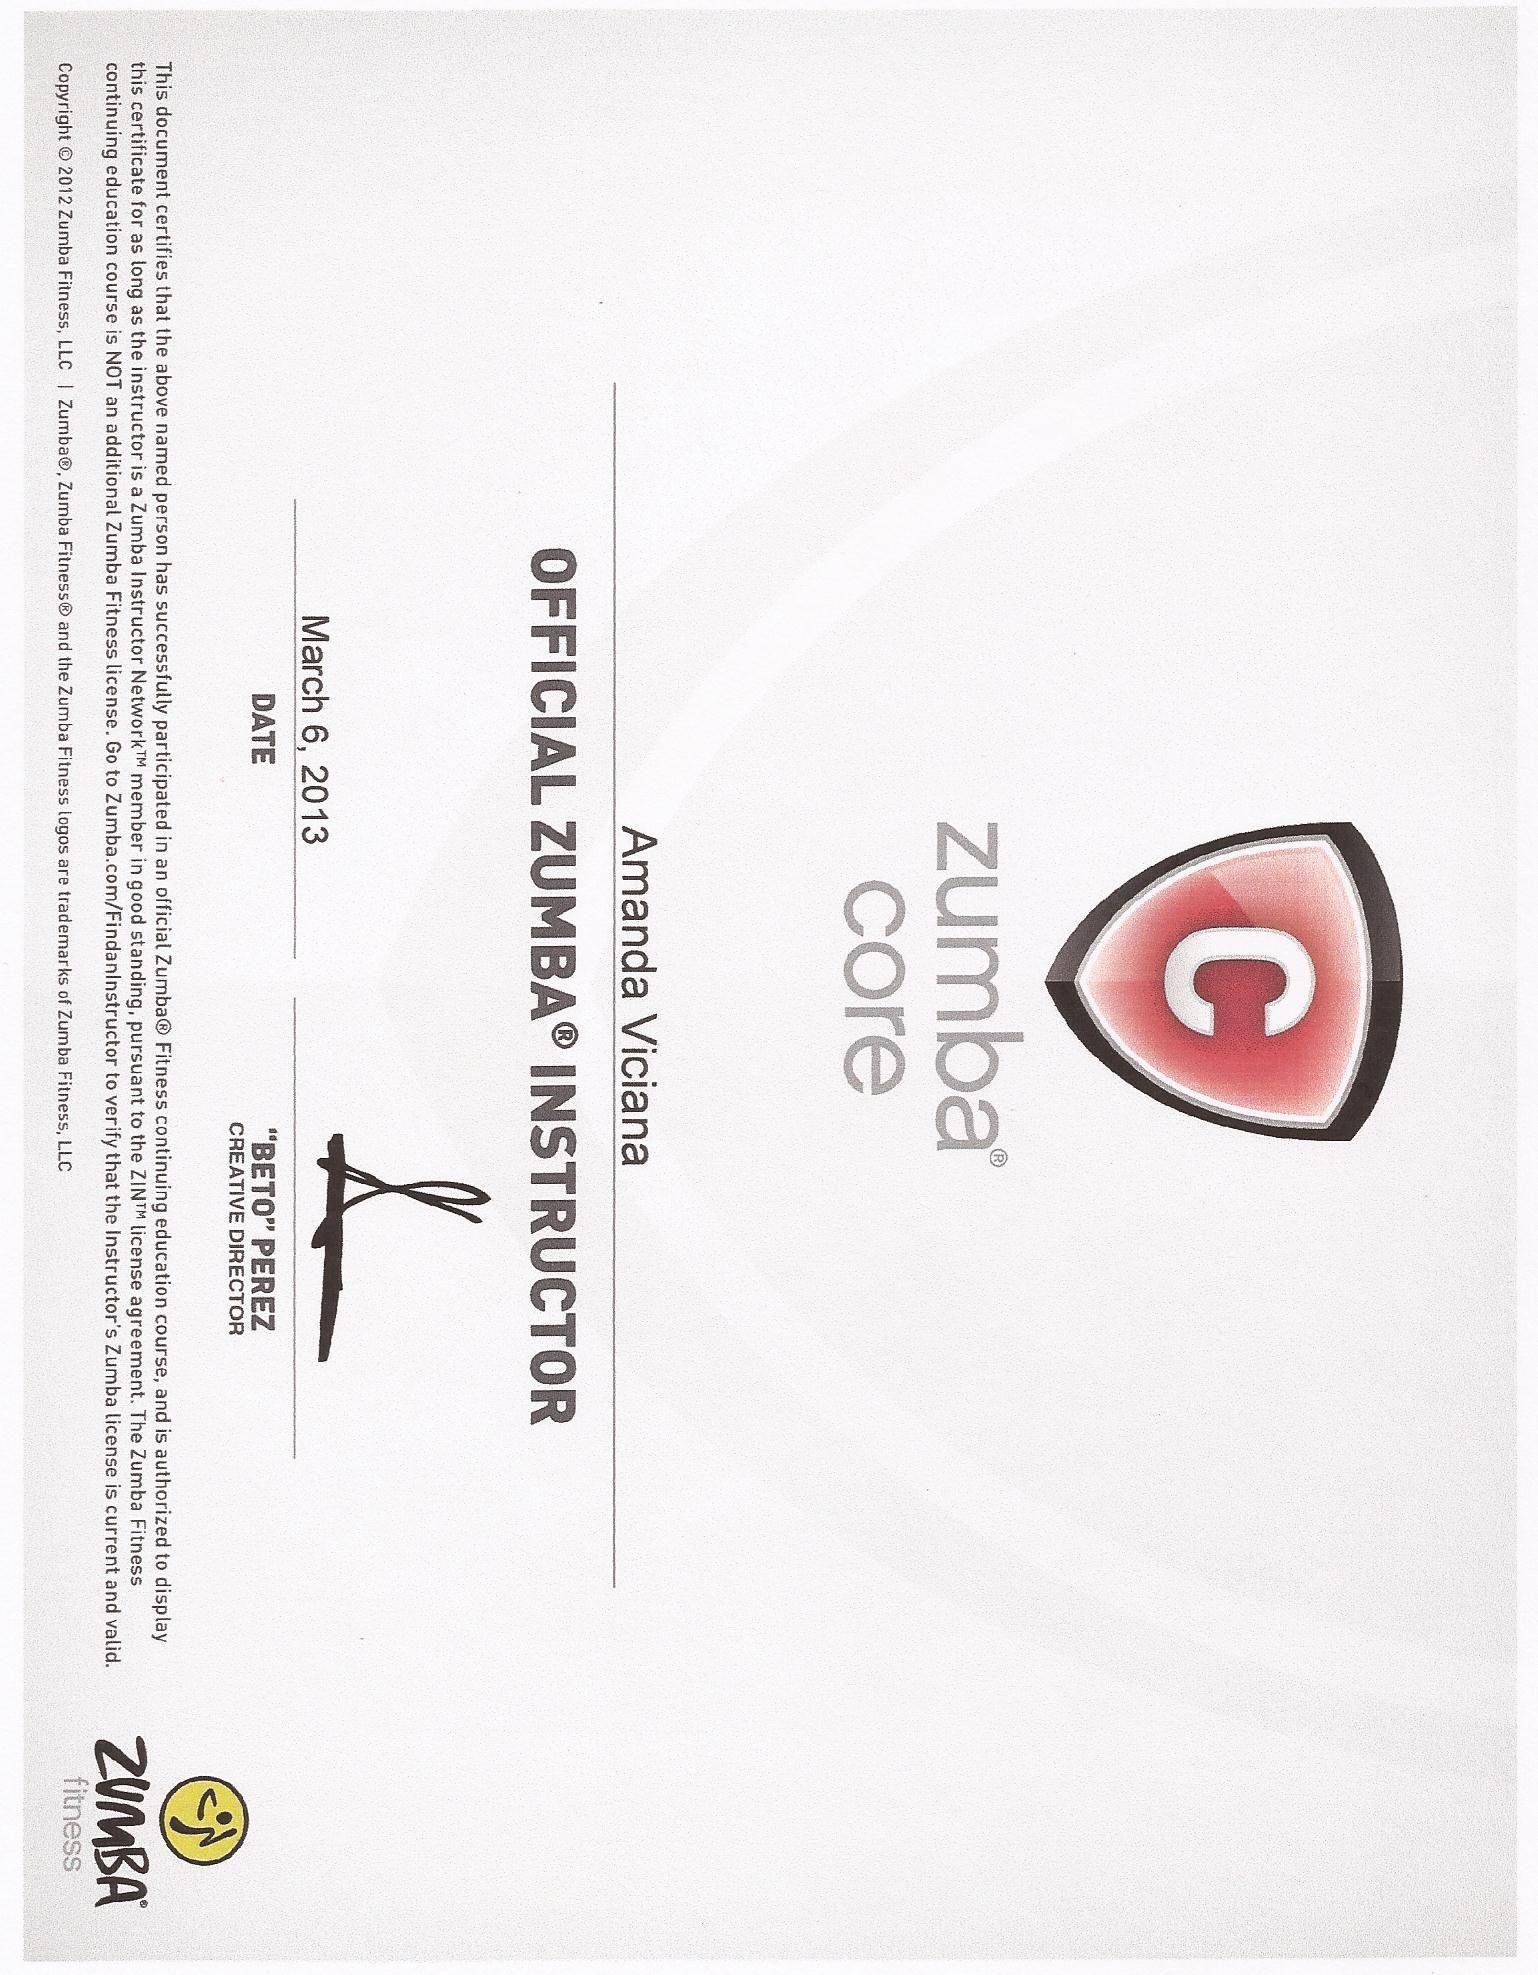 Zumba Core Certification Work Hard Fitness Pinterest